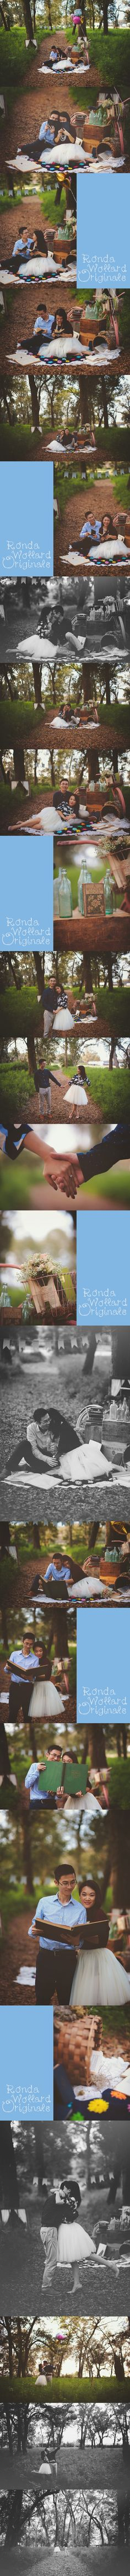 Ronda Wollards Originals- Deland Photographer- Child Maternity Family Photographer_0006